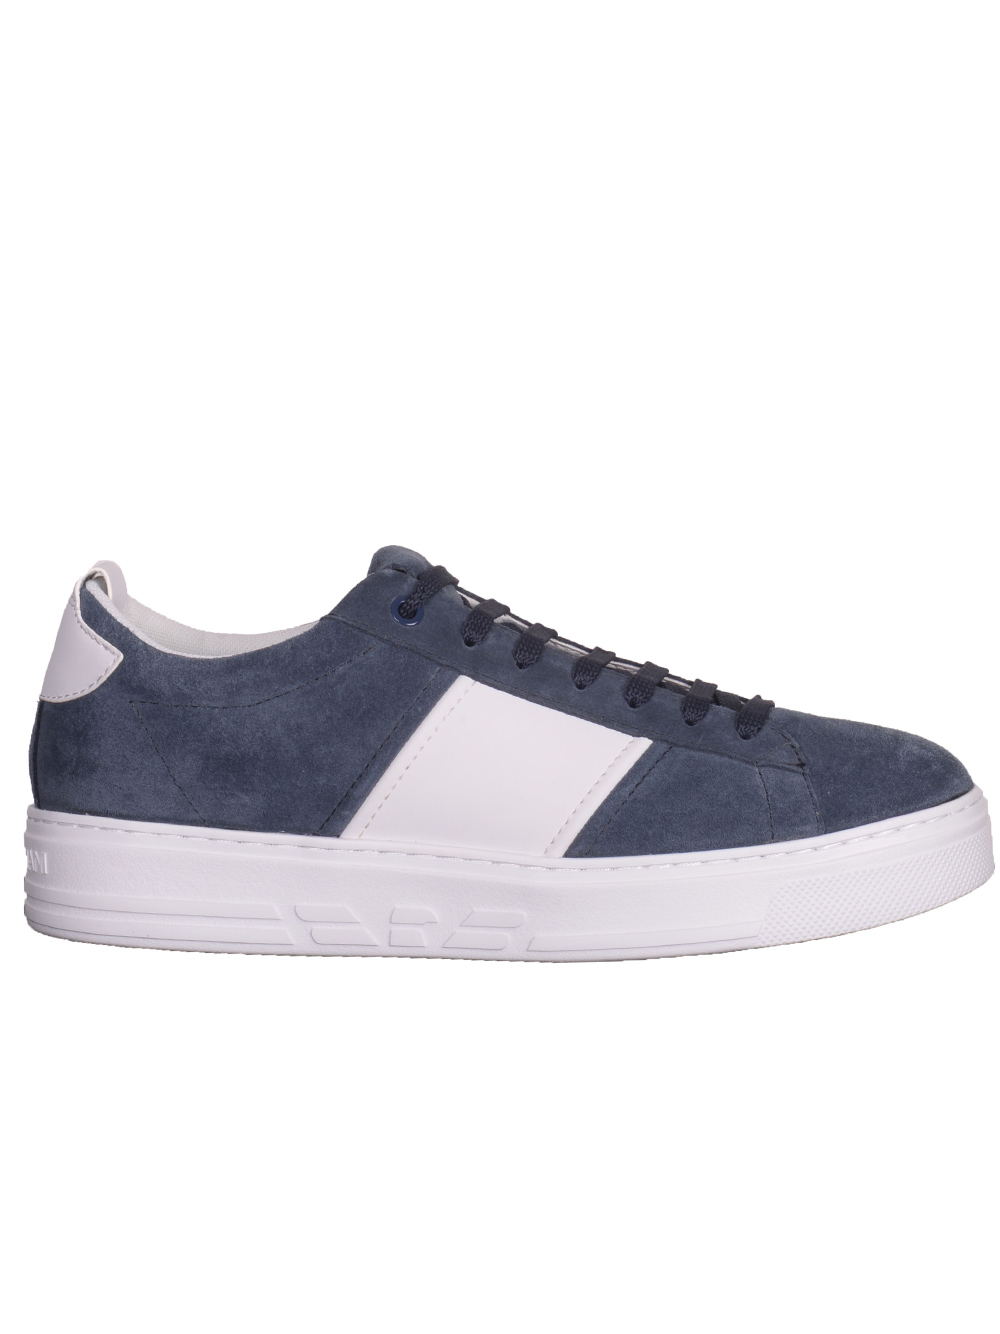 EMPORIO ARMANI Παπούτσια Sneakers X4X287 ΧΜ317-2817 ΜΠΛΕ